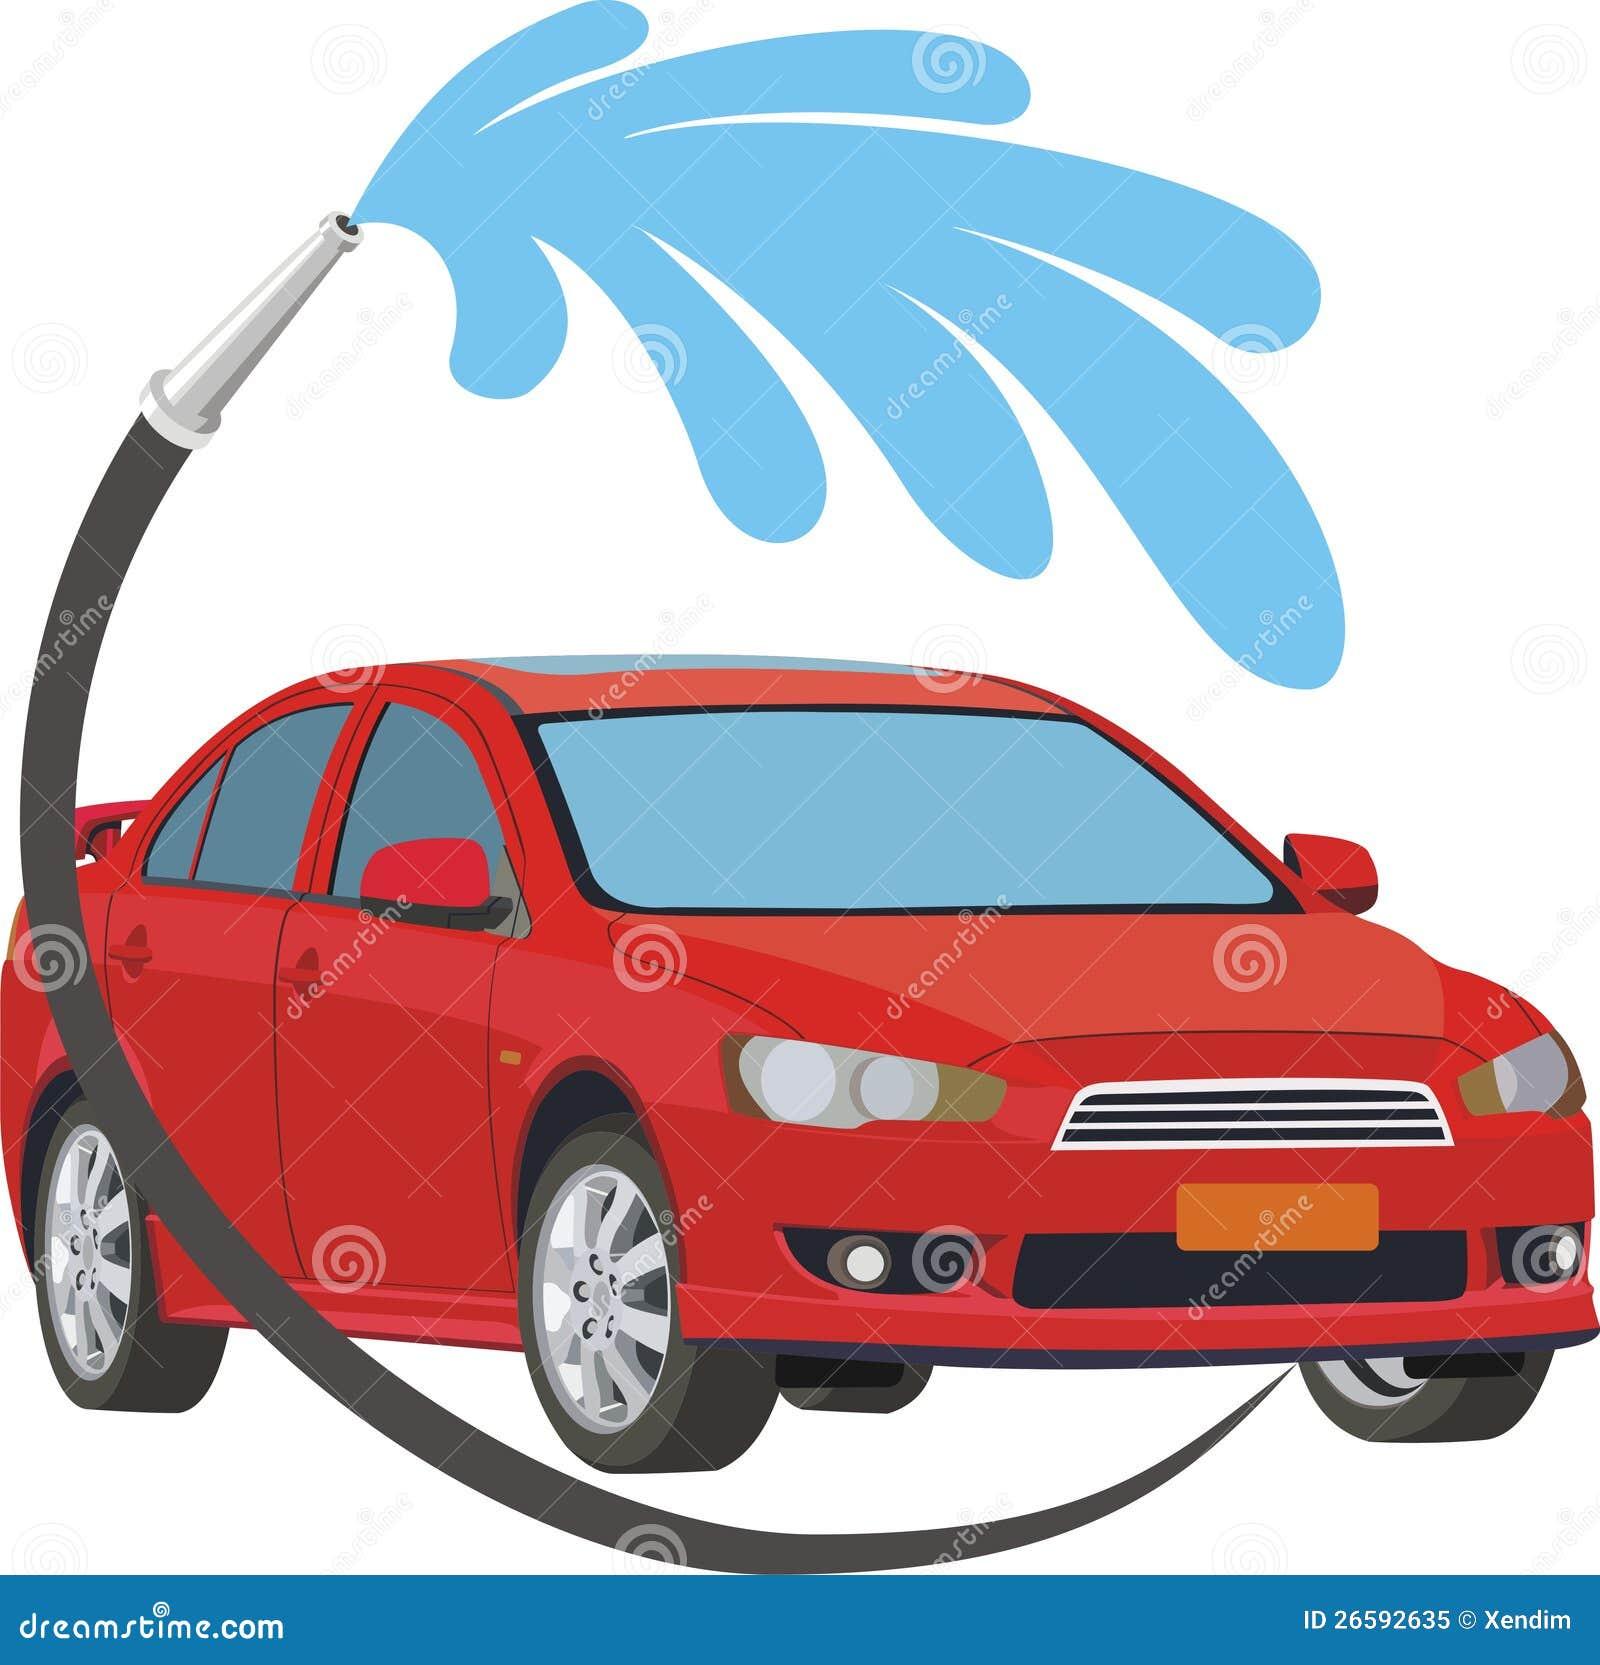 car wash stock vector image of hose vehicle vehicles 26592635. Black Bedroom Furniture Sets. Home Design Ideas